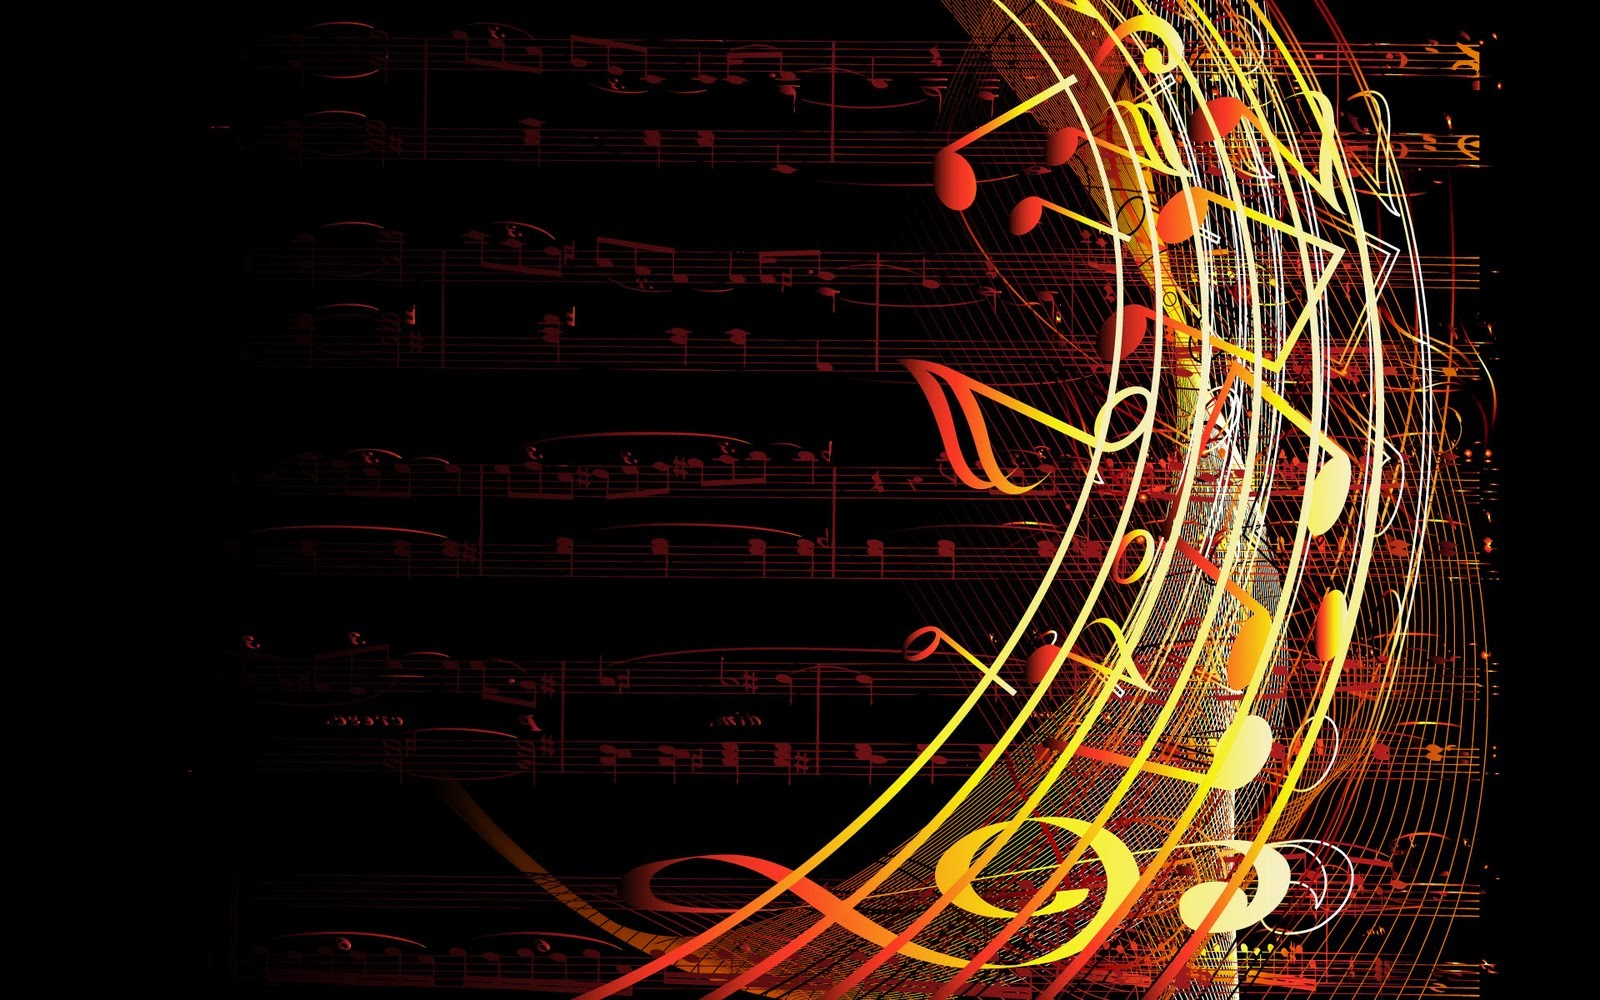 Music Wallpaper Hd: Wallpaper Free: Music Wallpapers High Resolution